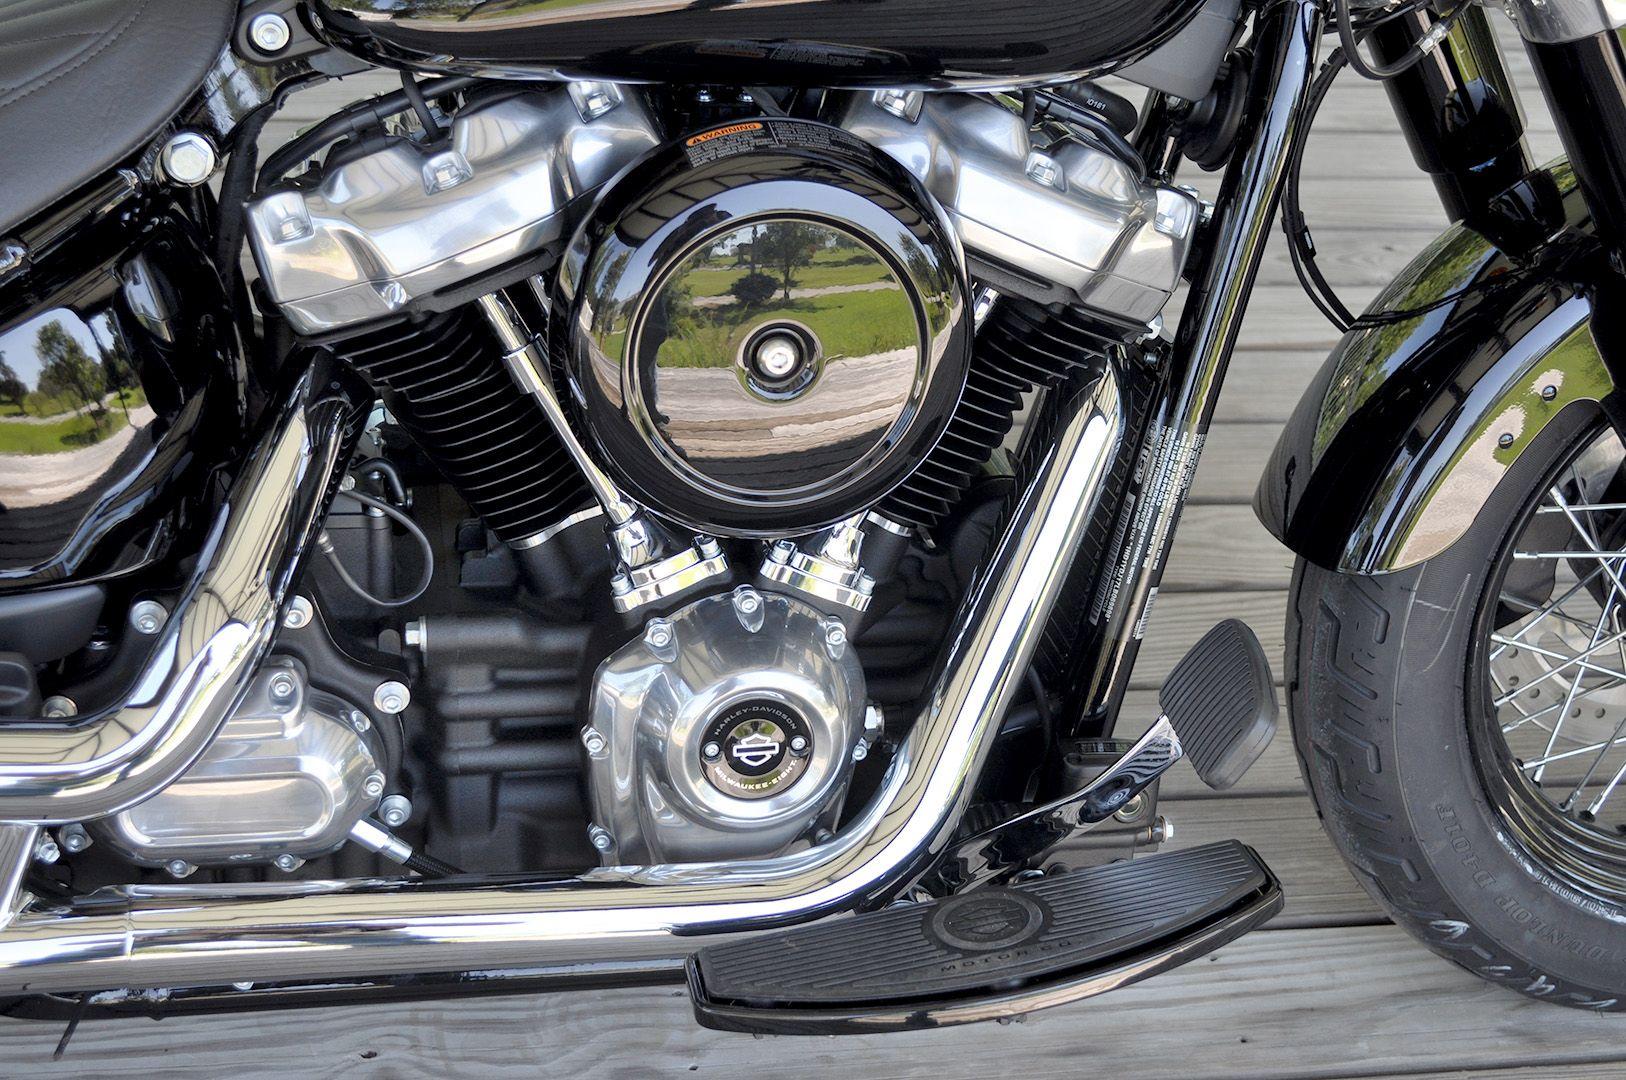 New 2020 Harley-Davidson Softail Slim